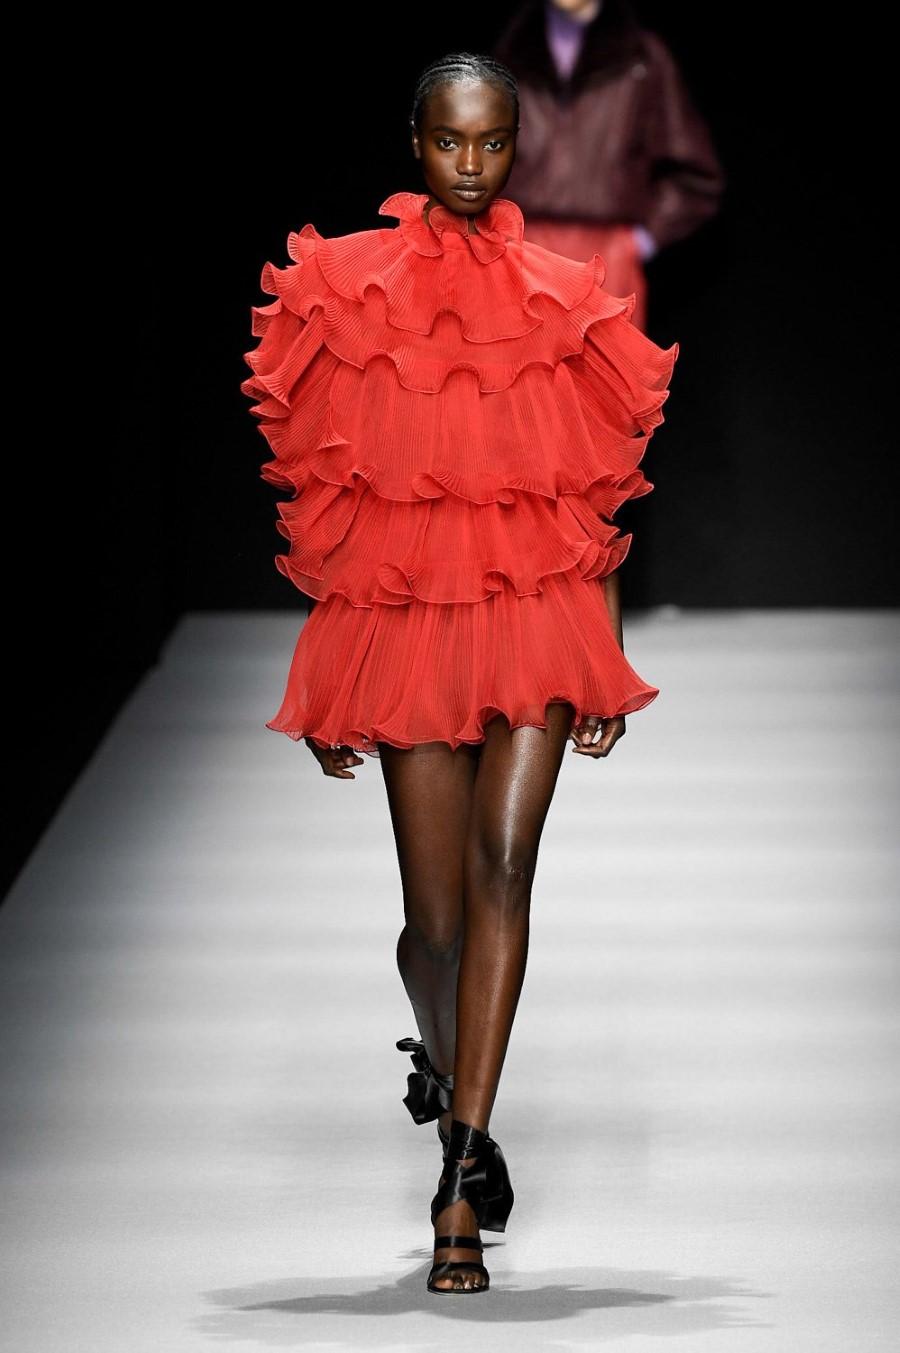 Alberta Ferretti - Fall Winter 2020 - Milan Fashion WeekAlberta Ferretti - Fall Winter 2020 - Milan Fashion Week